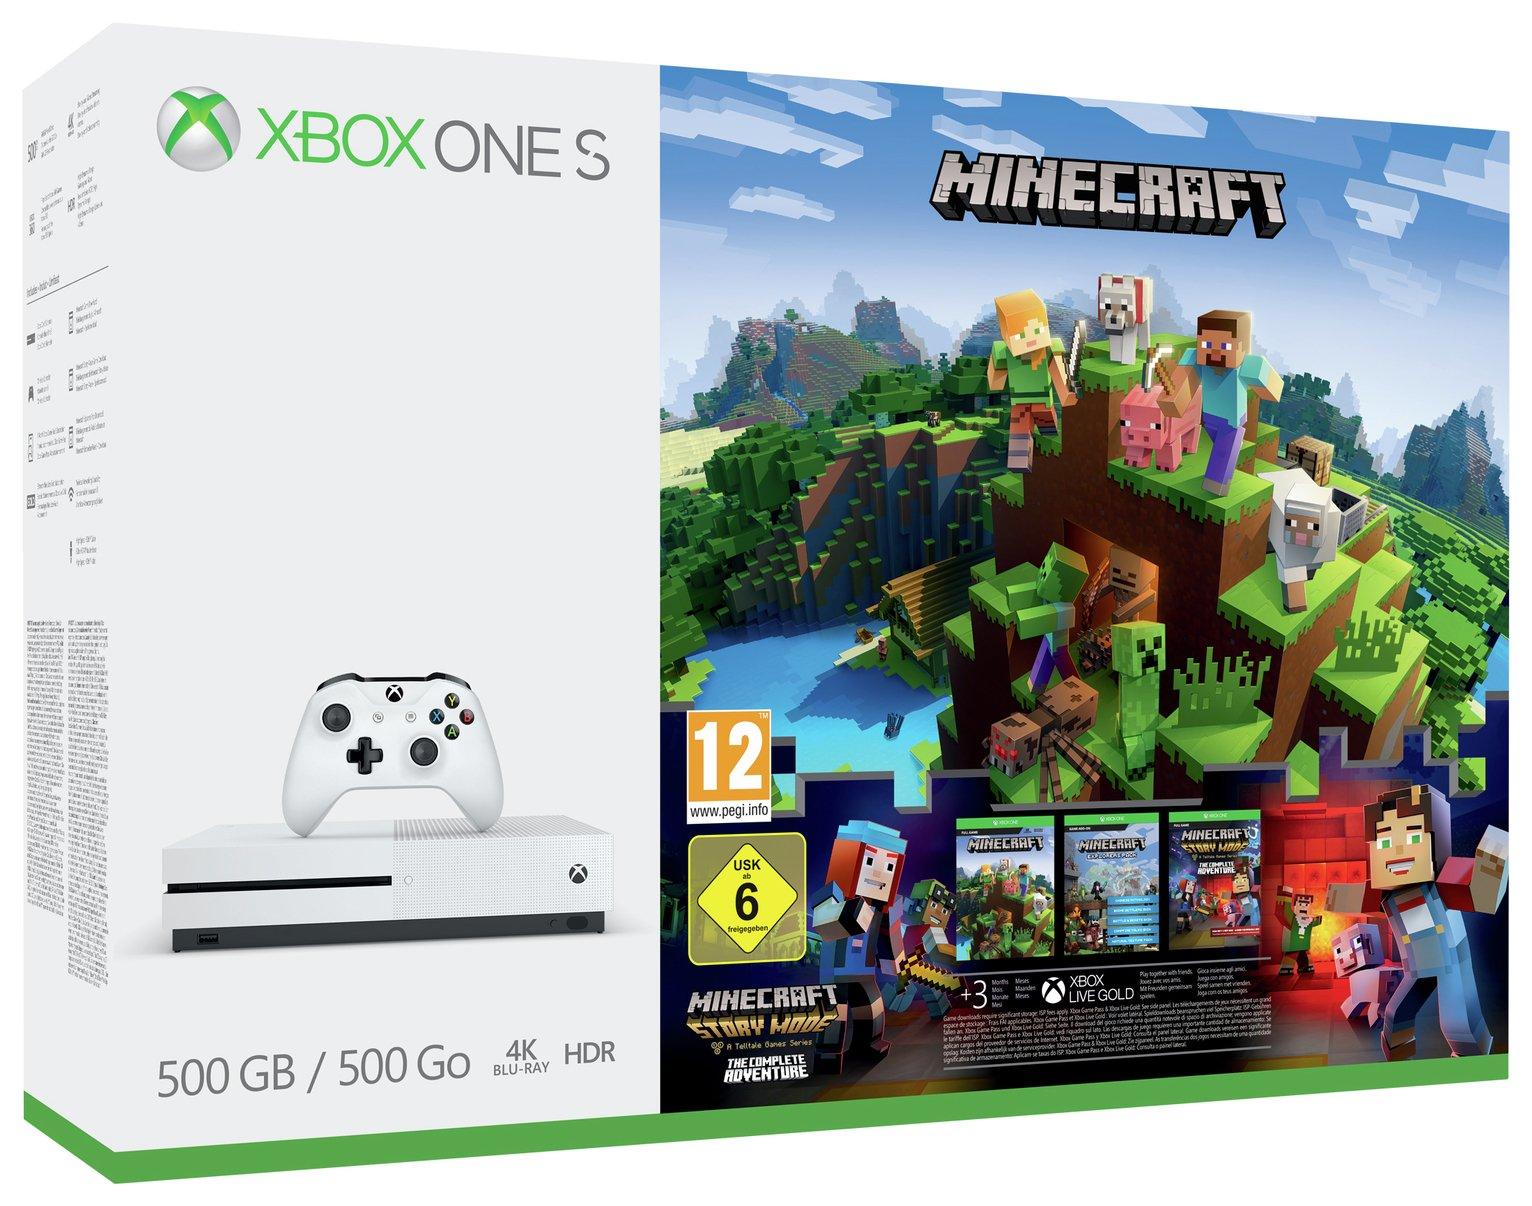 Xbox One S 500GB Minecraft Complete Adventure Console Bundle